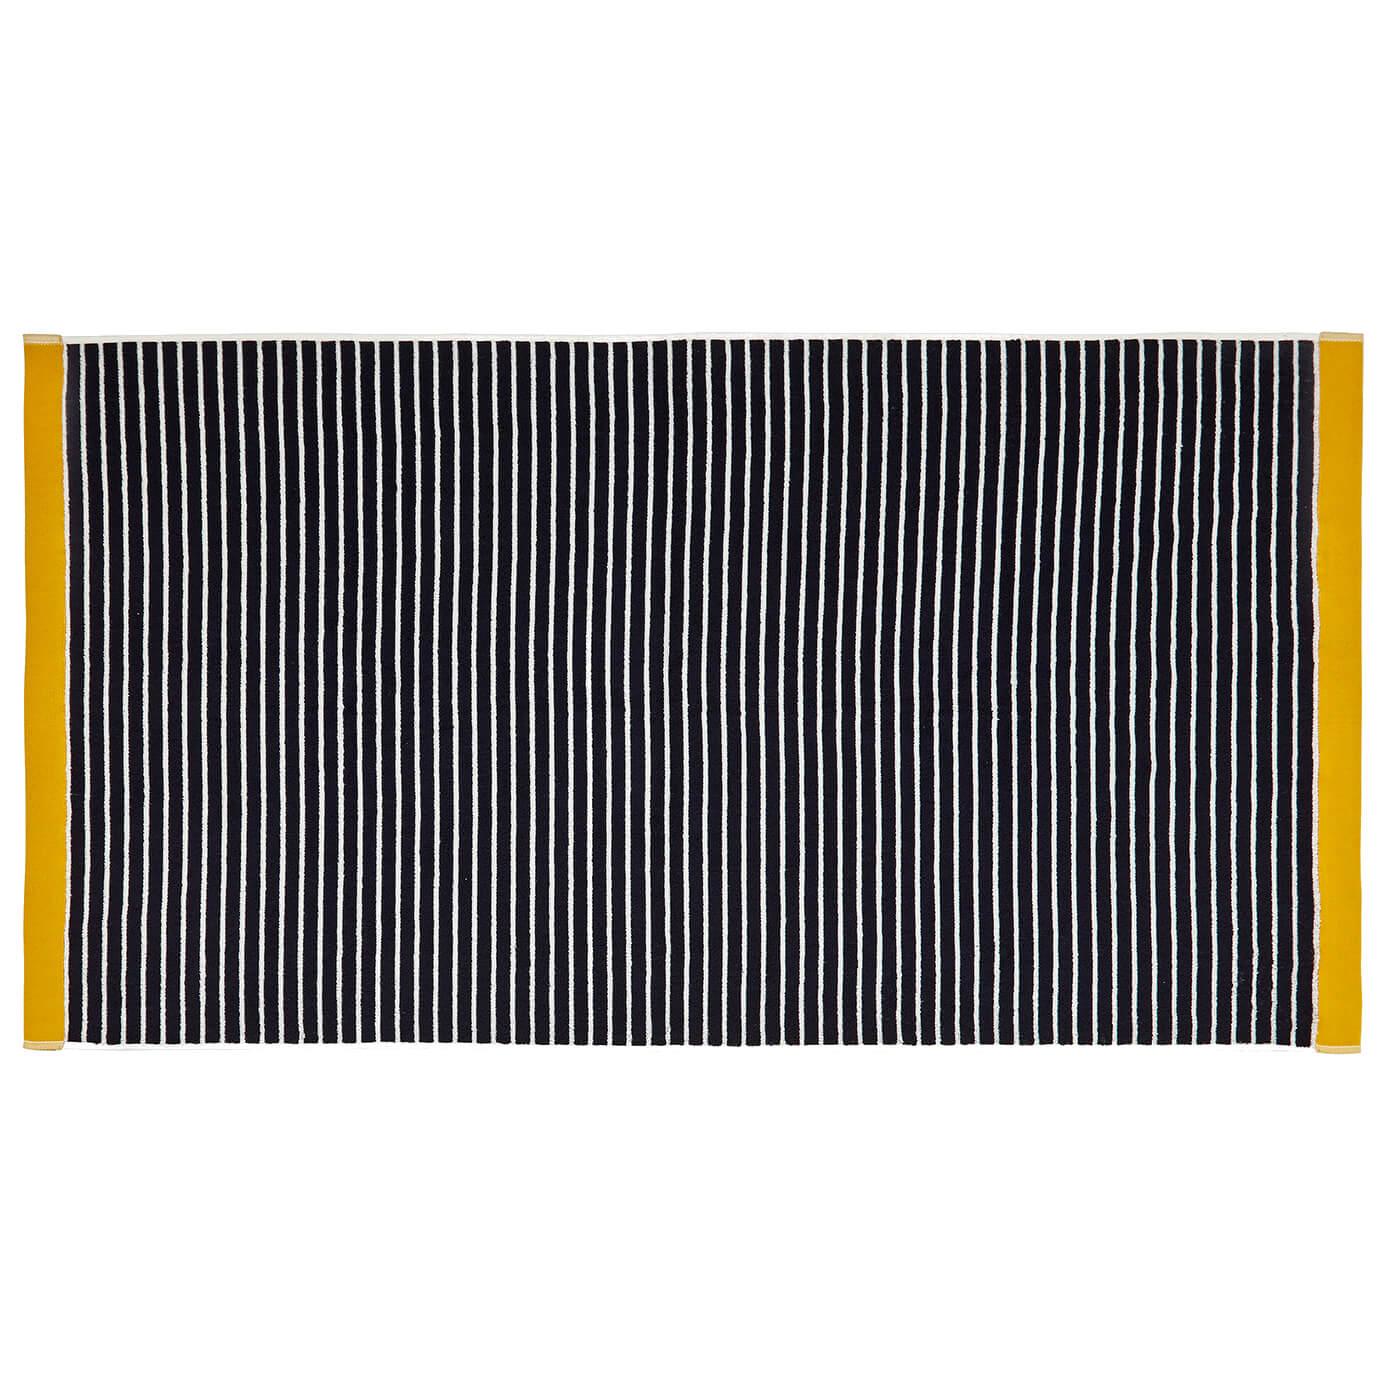 Joules Kensington Stripe Towels - Navy - Bath Towel